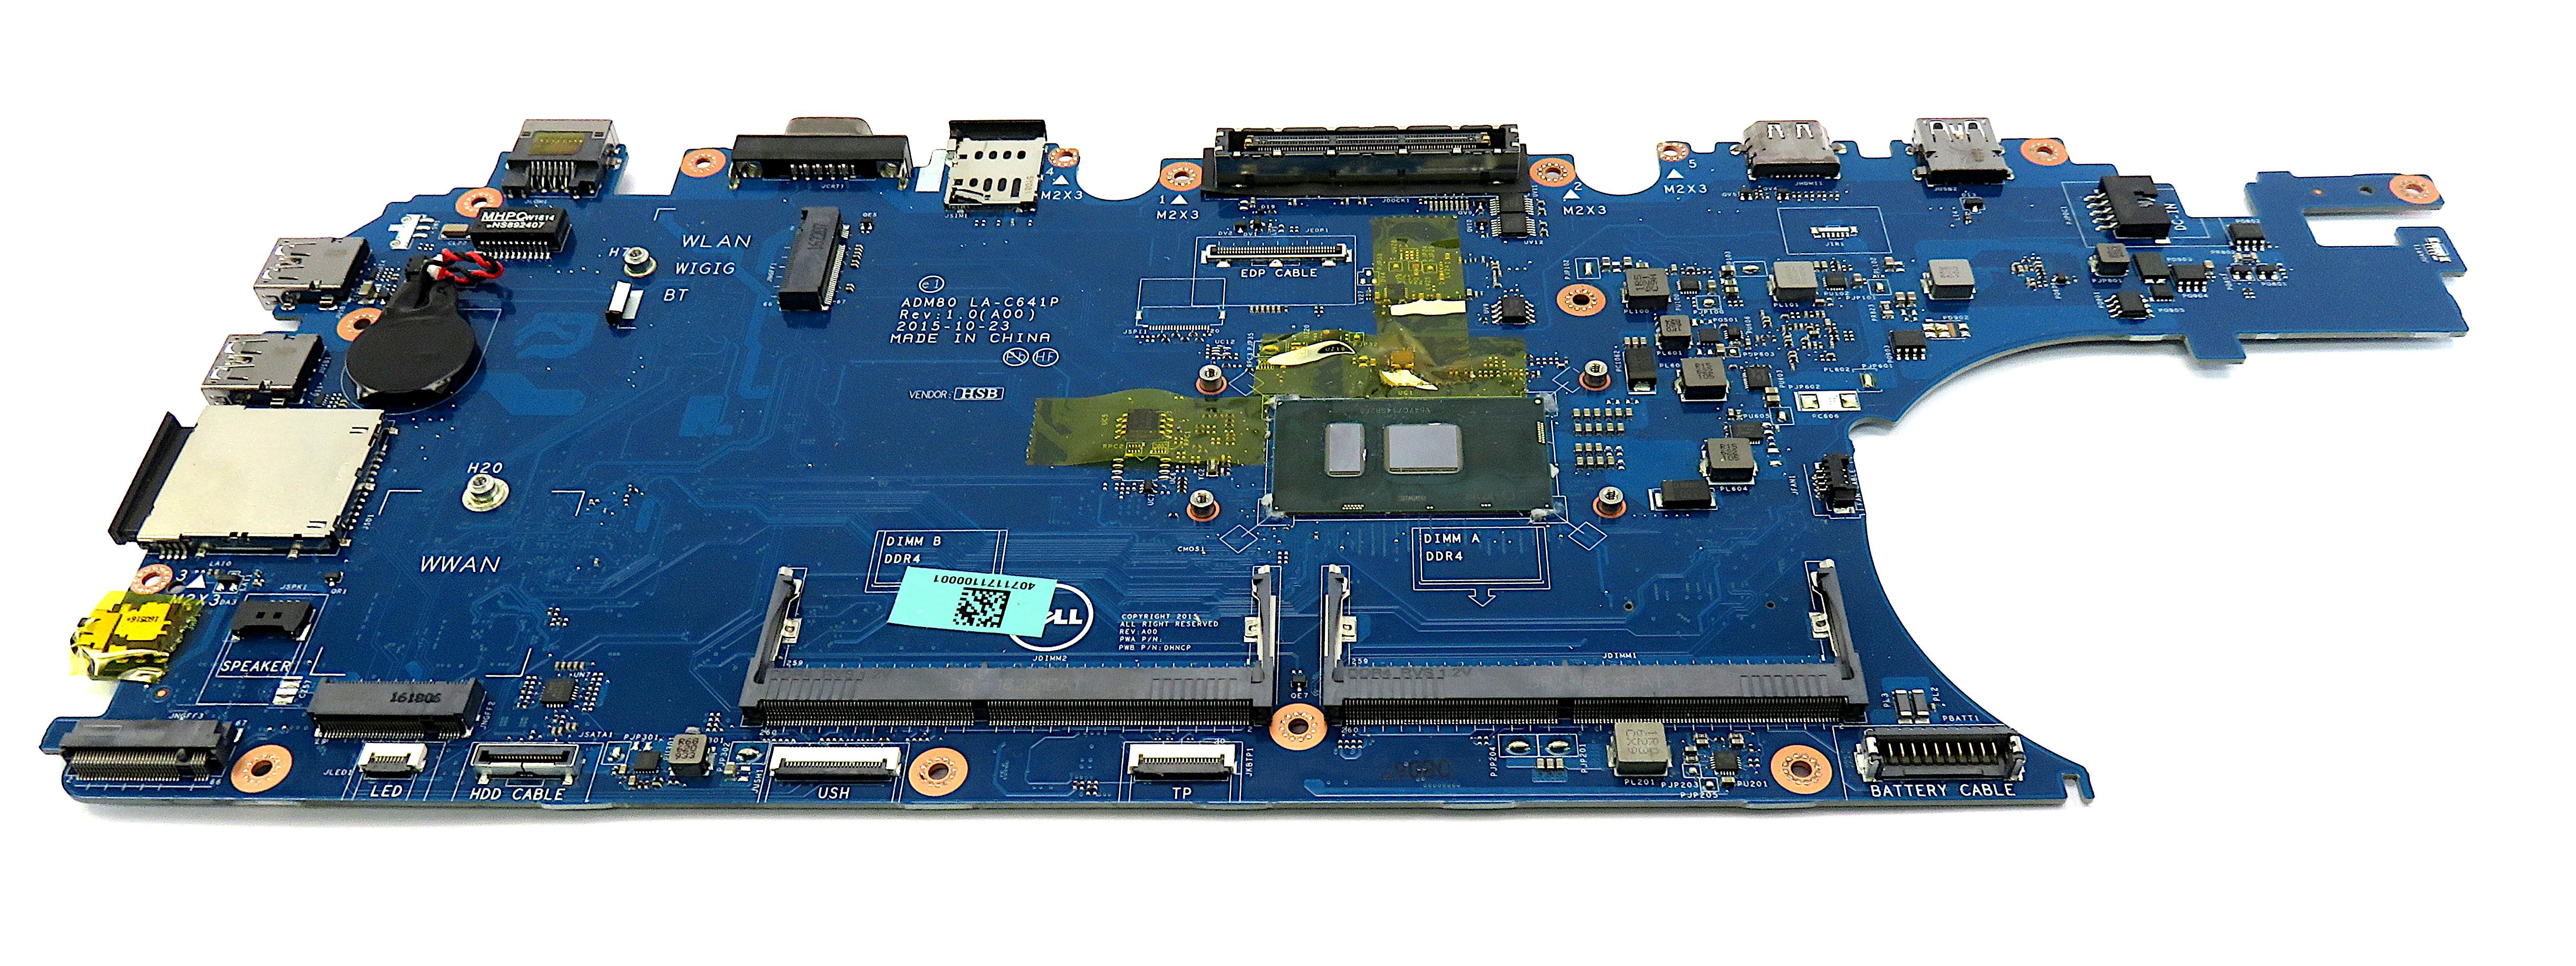 Dell Latitude E5570 Core i5-6300U 2.4GHz DDR4 SDRAM Laptop Motherboard - 3MCRF